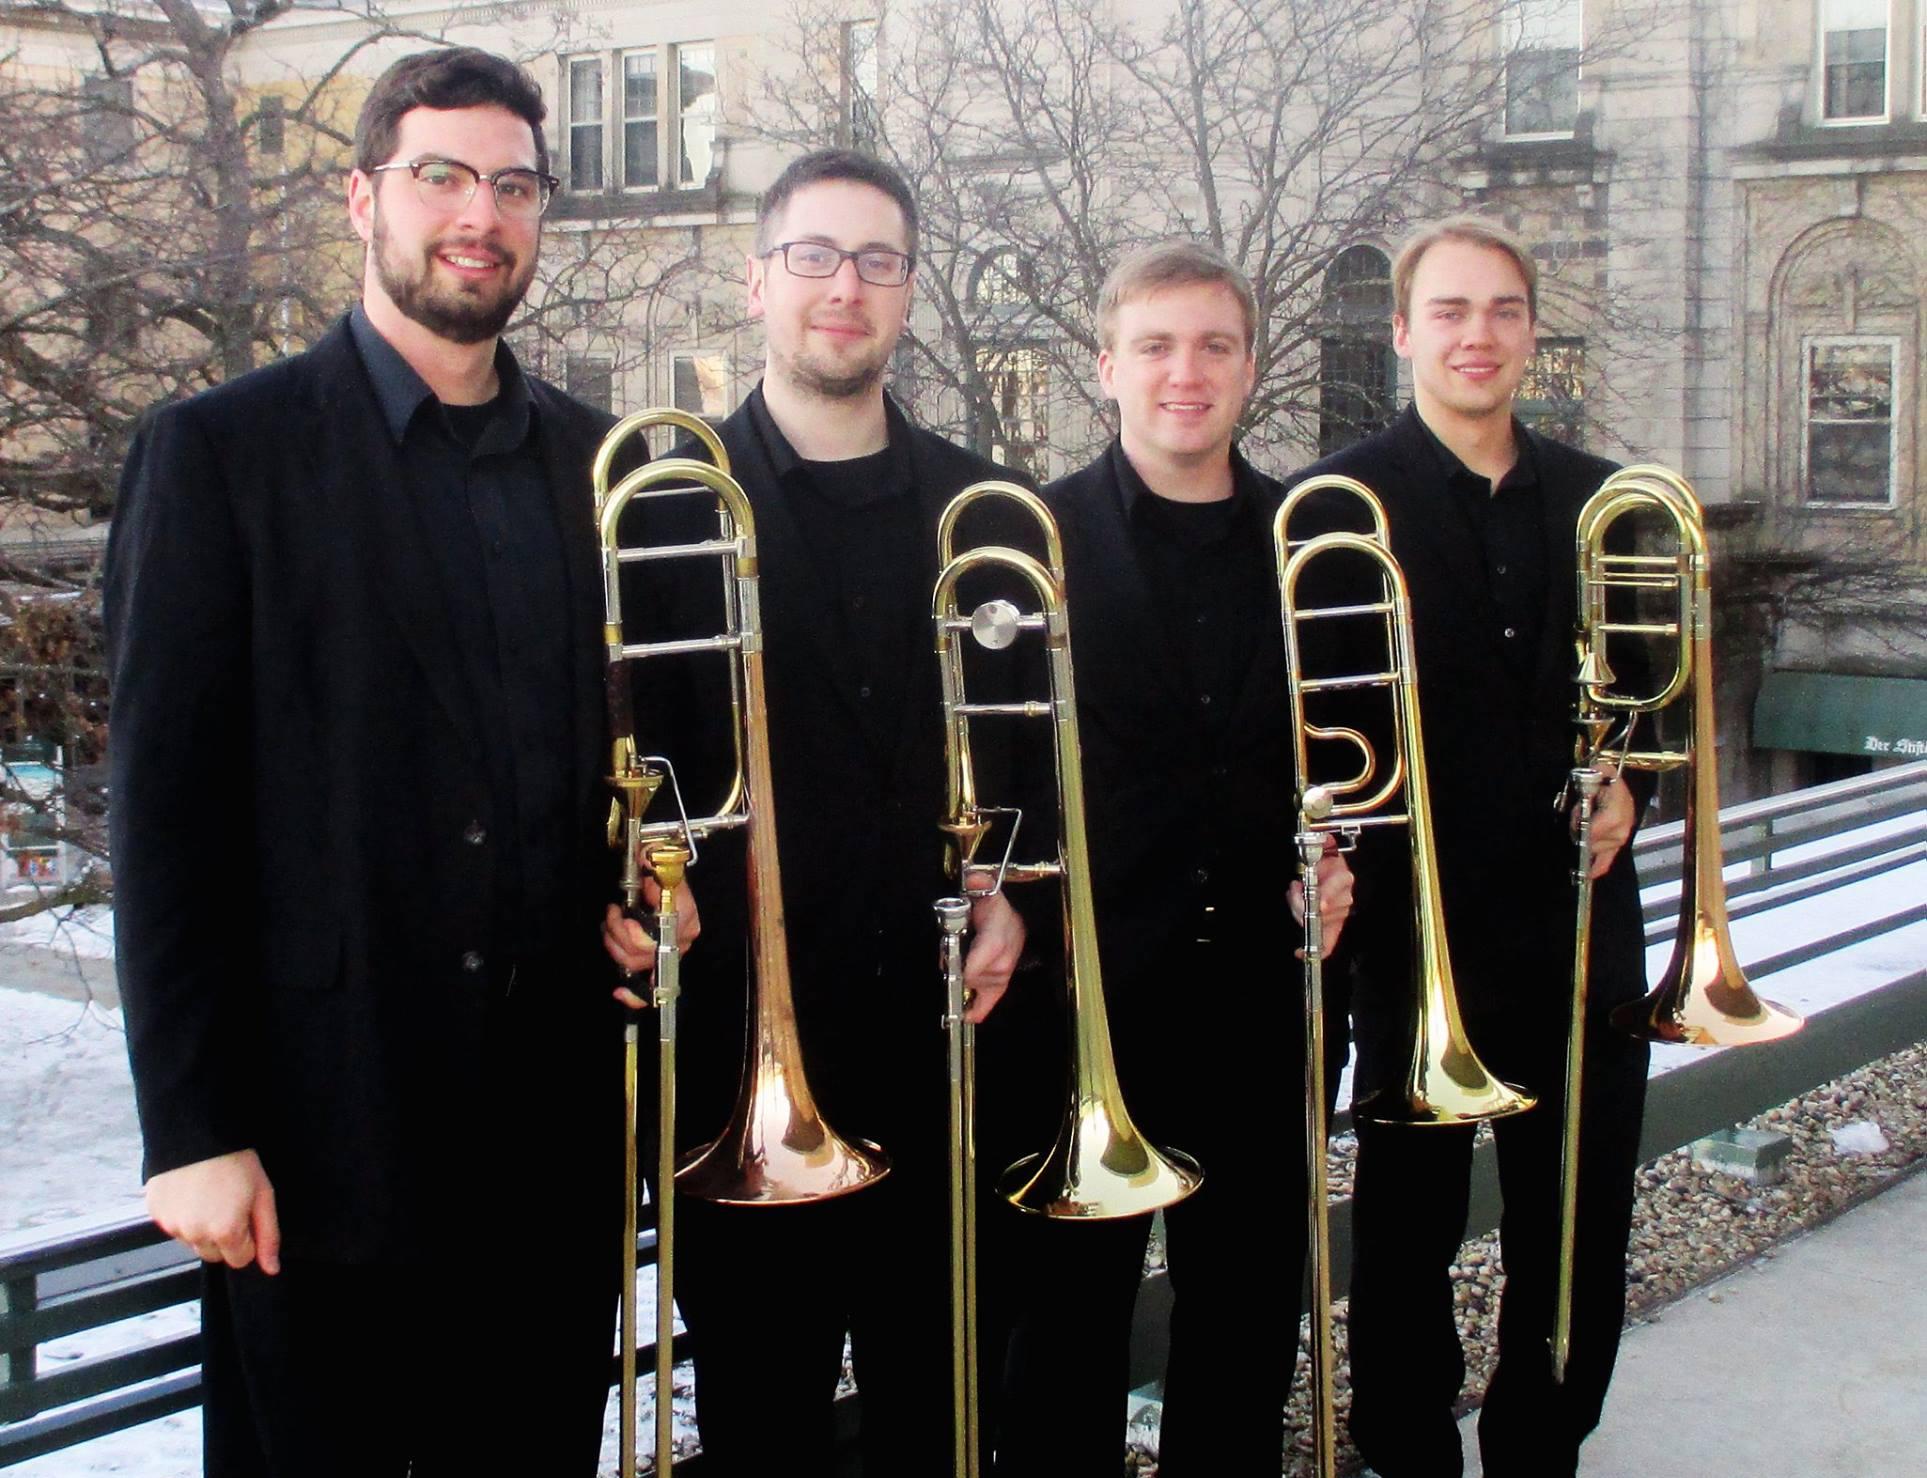 University of Wisconsin-Madison Trombone Quartet